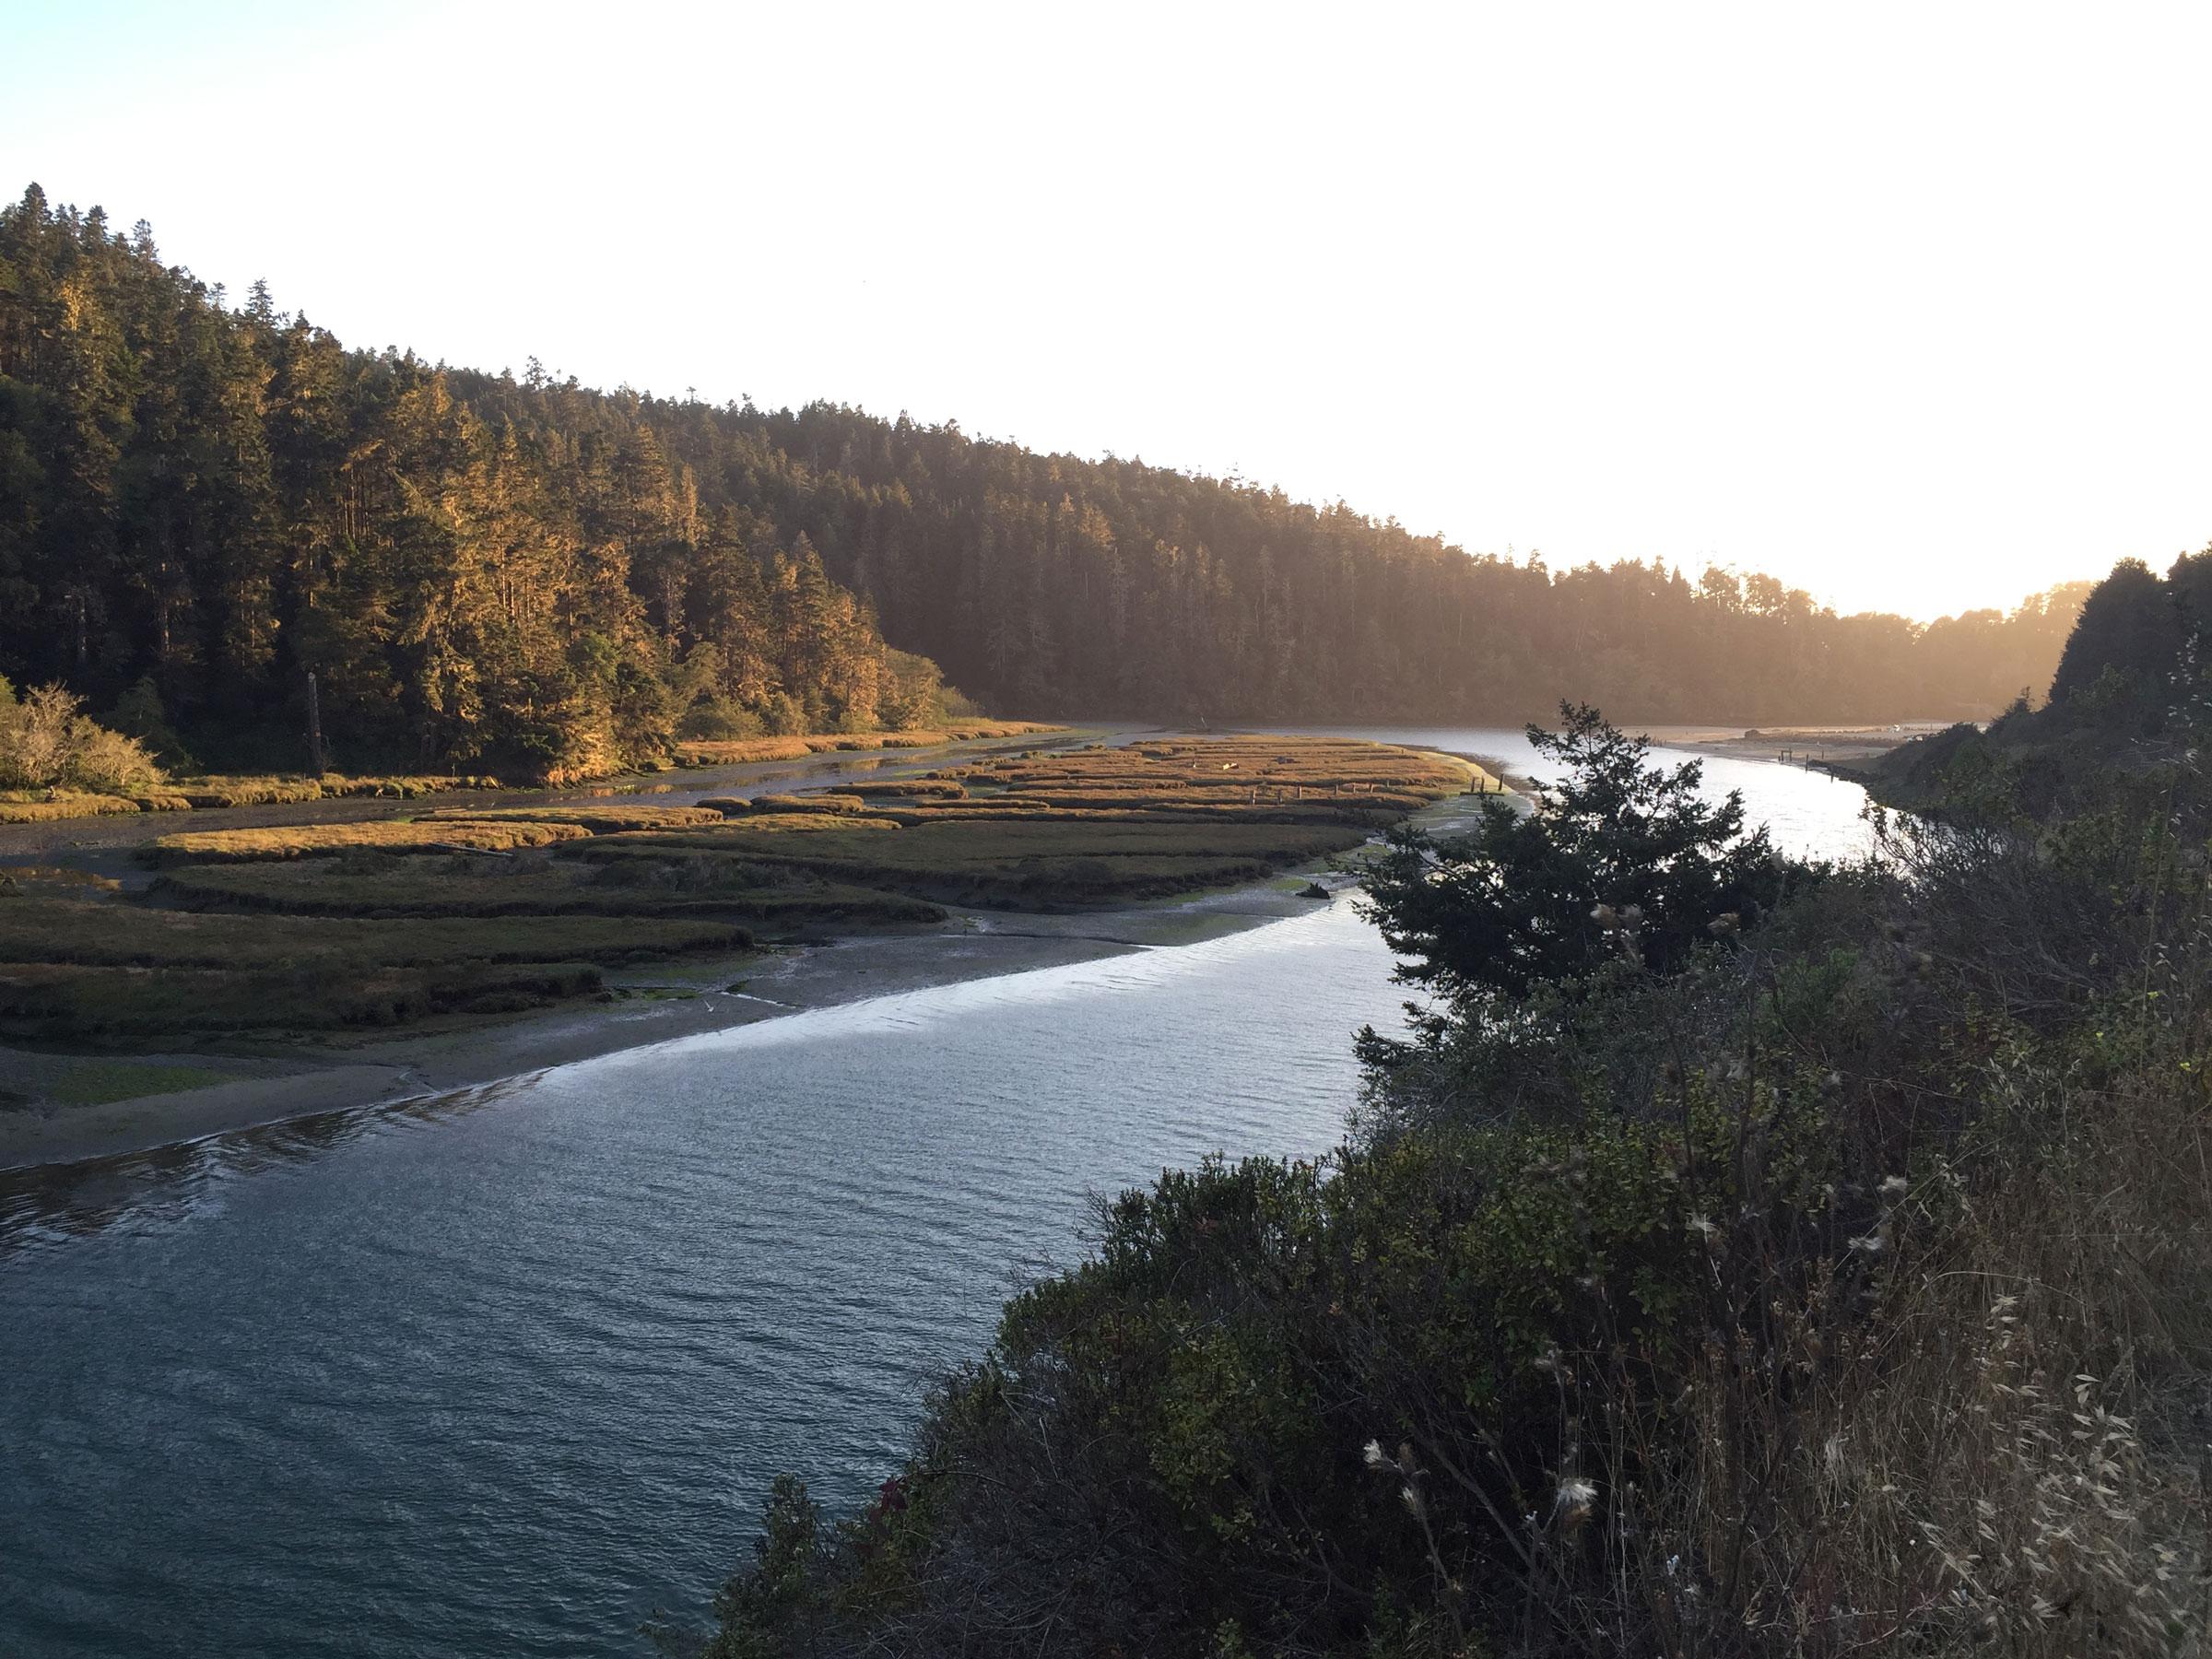 Beaches & Rivers